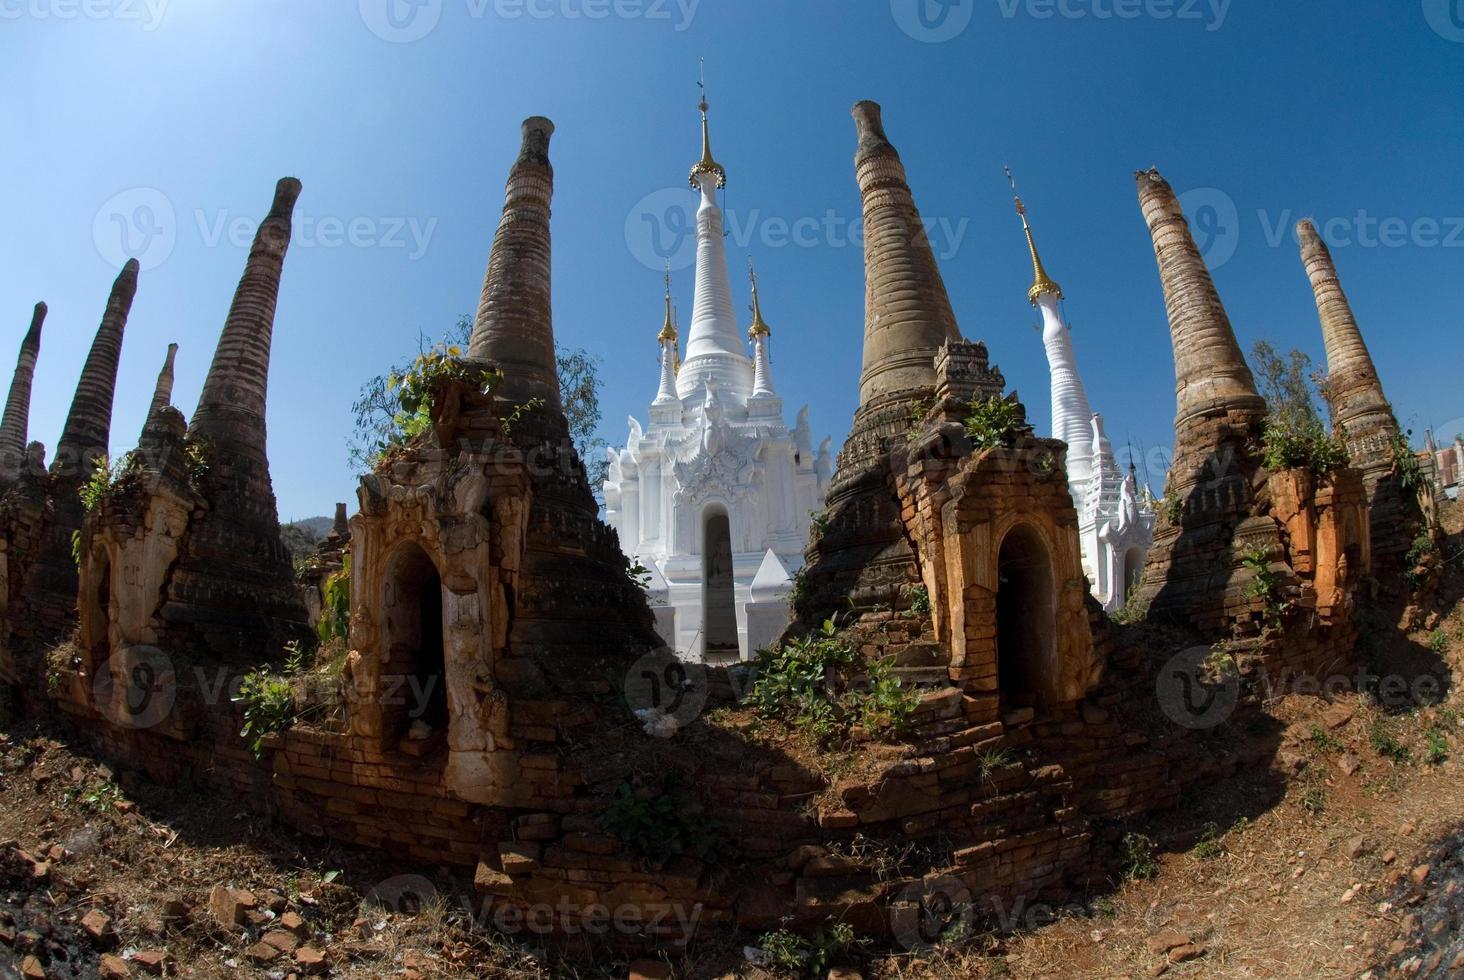 oude pagodes in herberg taing tempel van shan state. foto